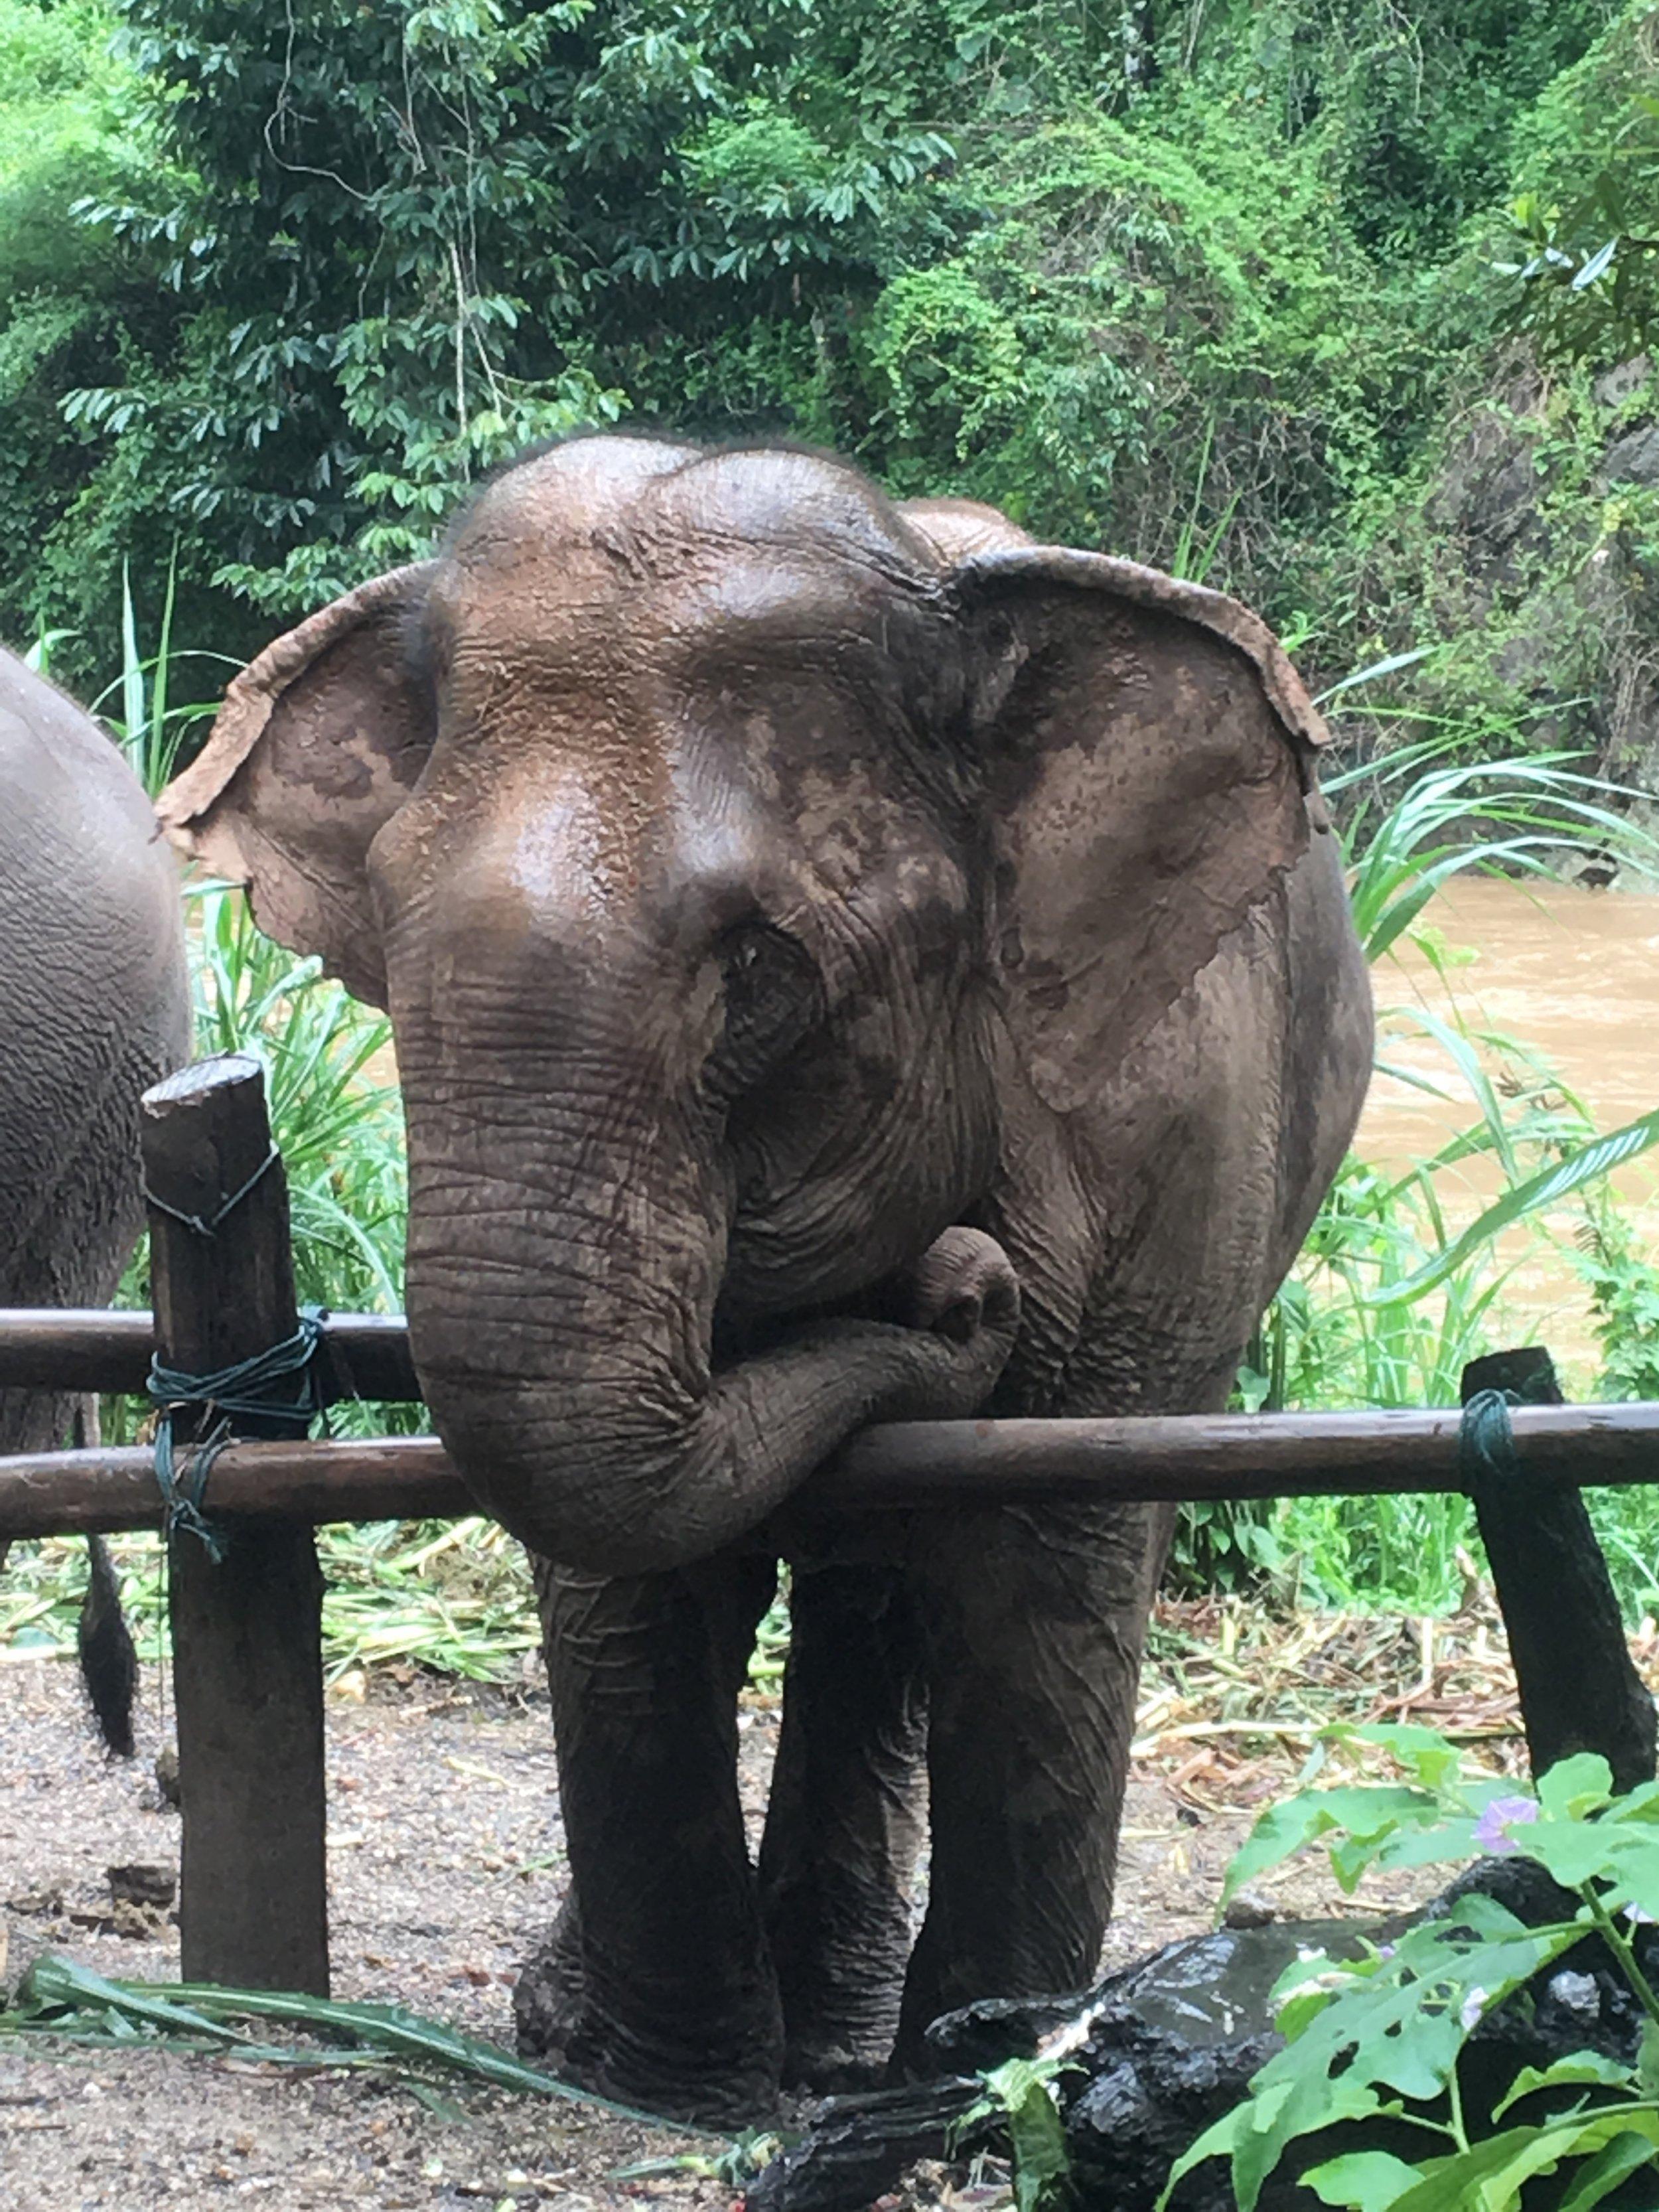 Elephant with an attitude.